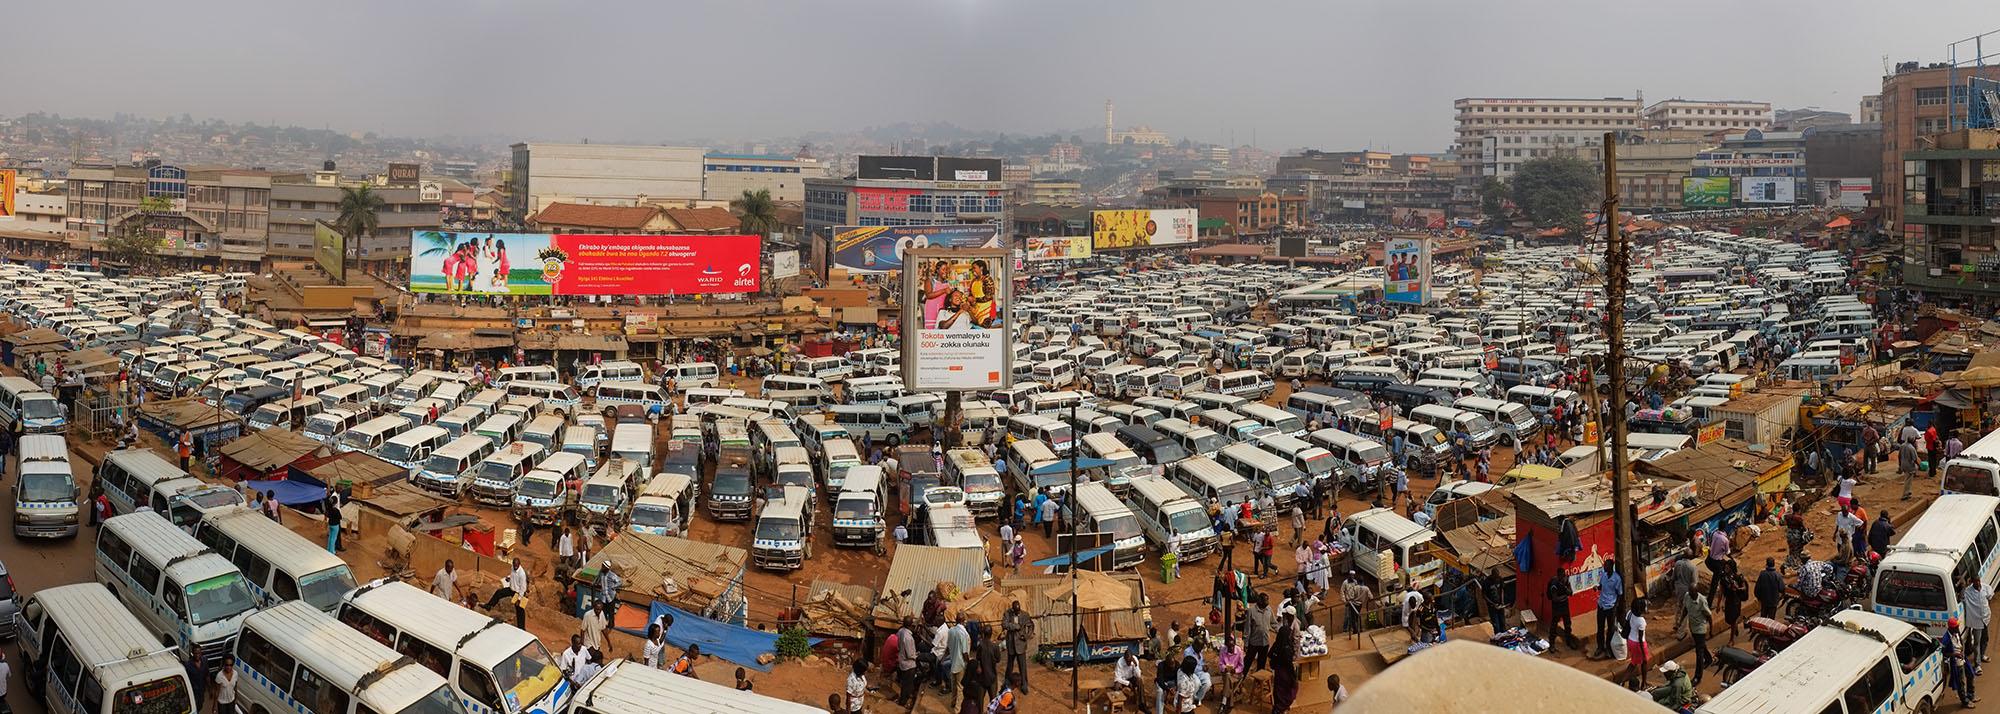 Panorama of central minibus station, Kampala, Uganda, © 2013 Fred Inklaar, Flickr.